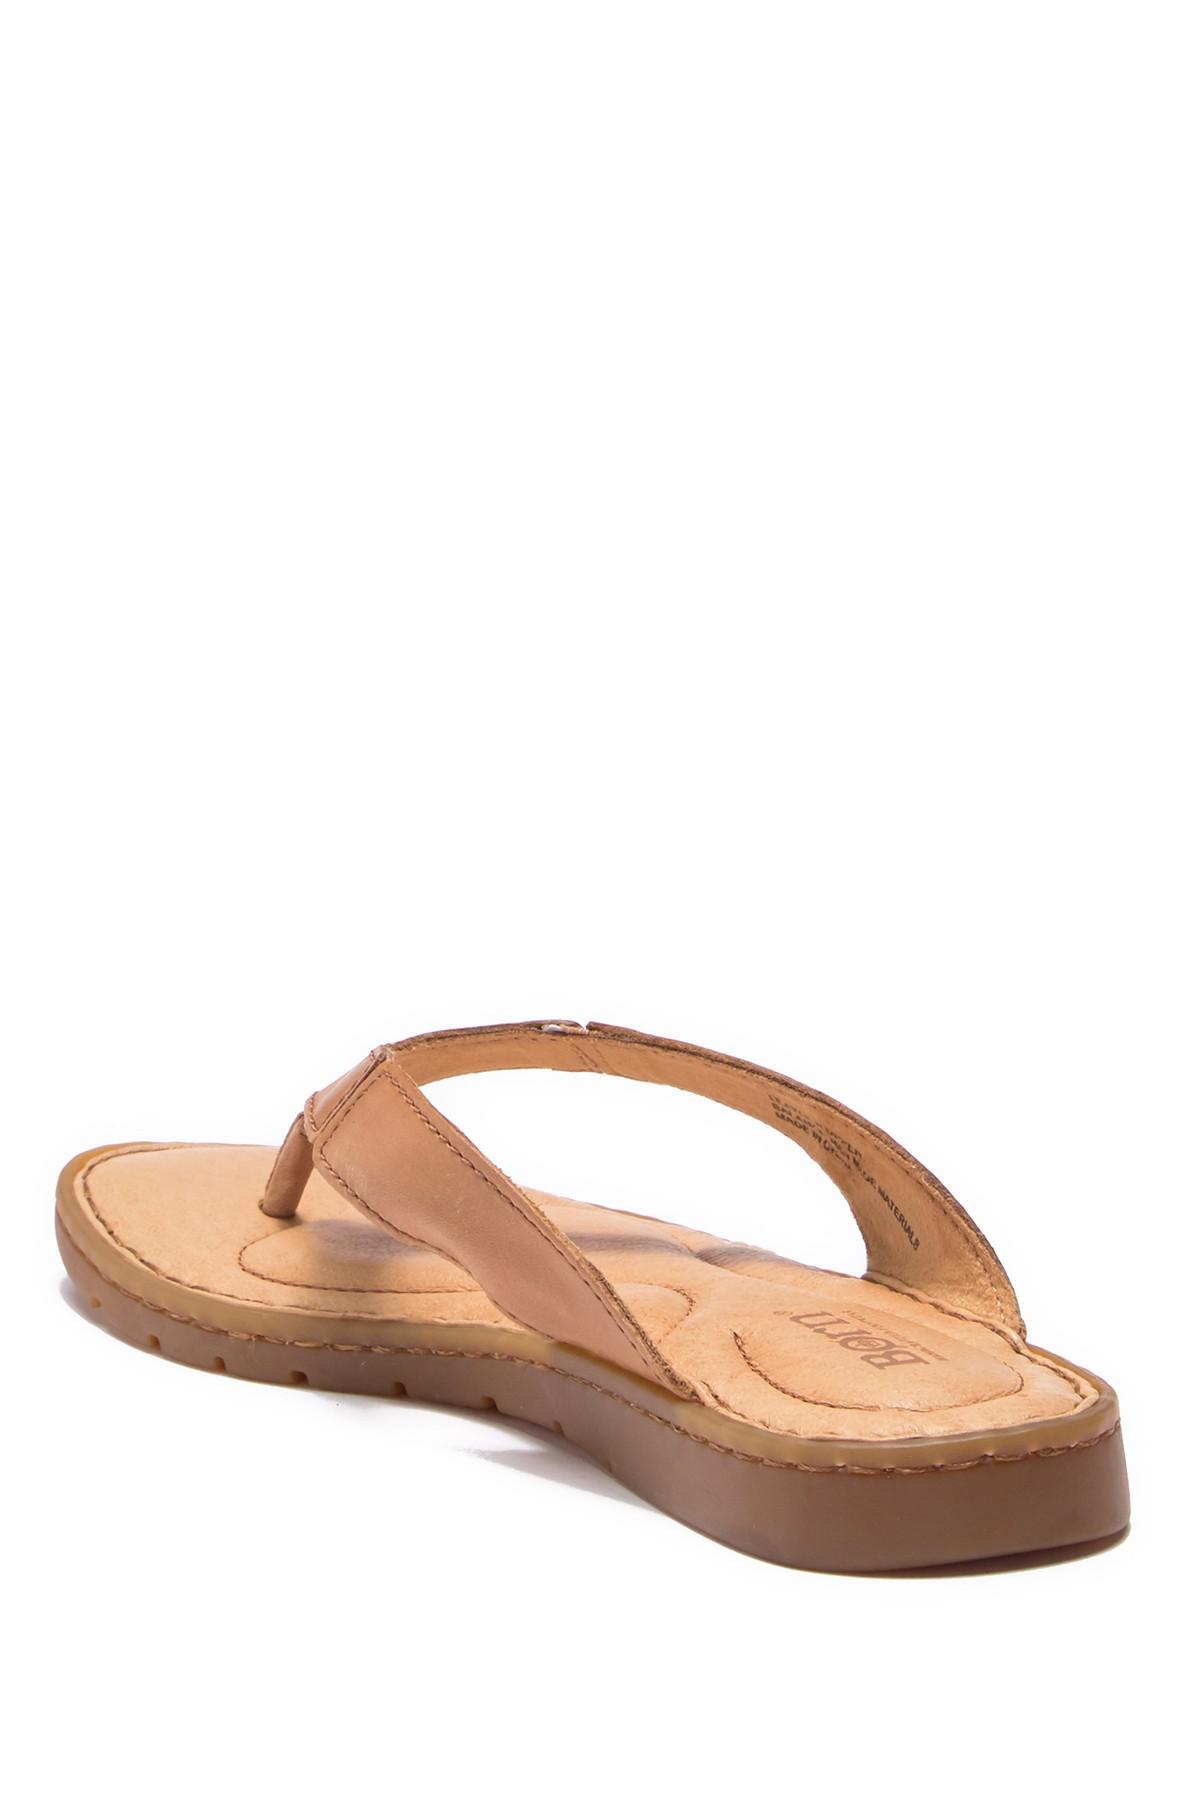 a10ad7d72a814 Born - Brown Amelie Leather Flip Flop Sandal - Lyst. View fullscreen